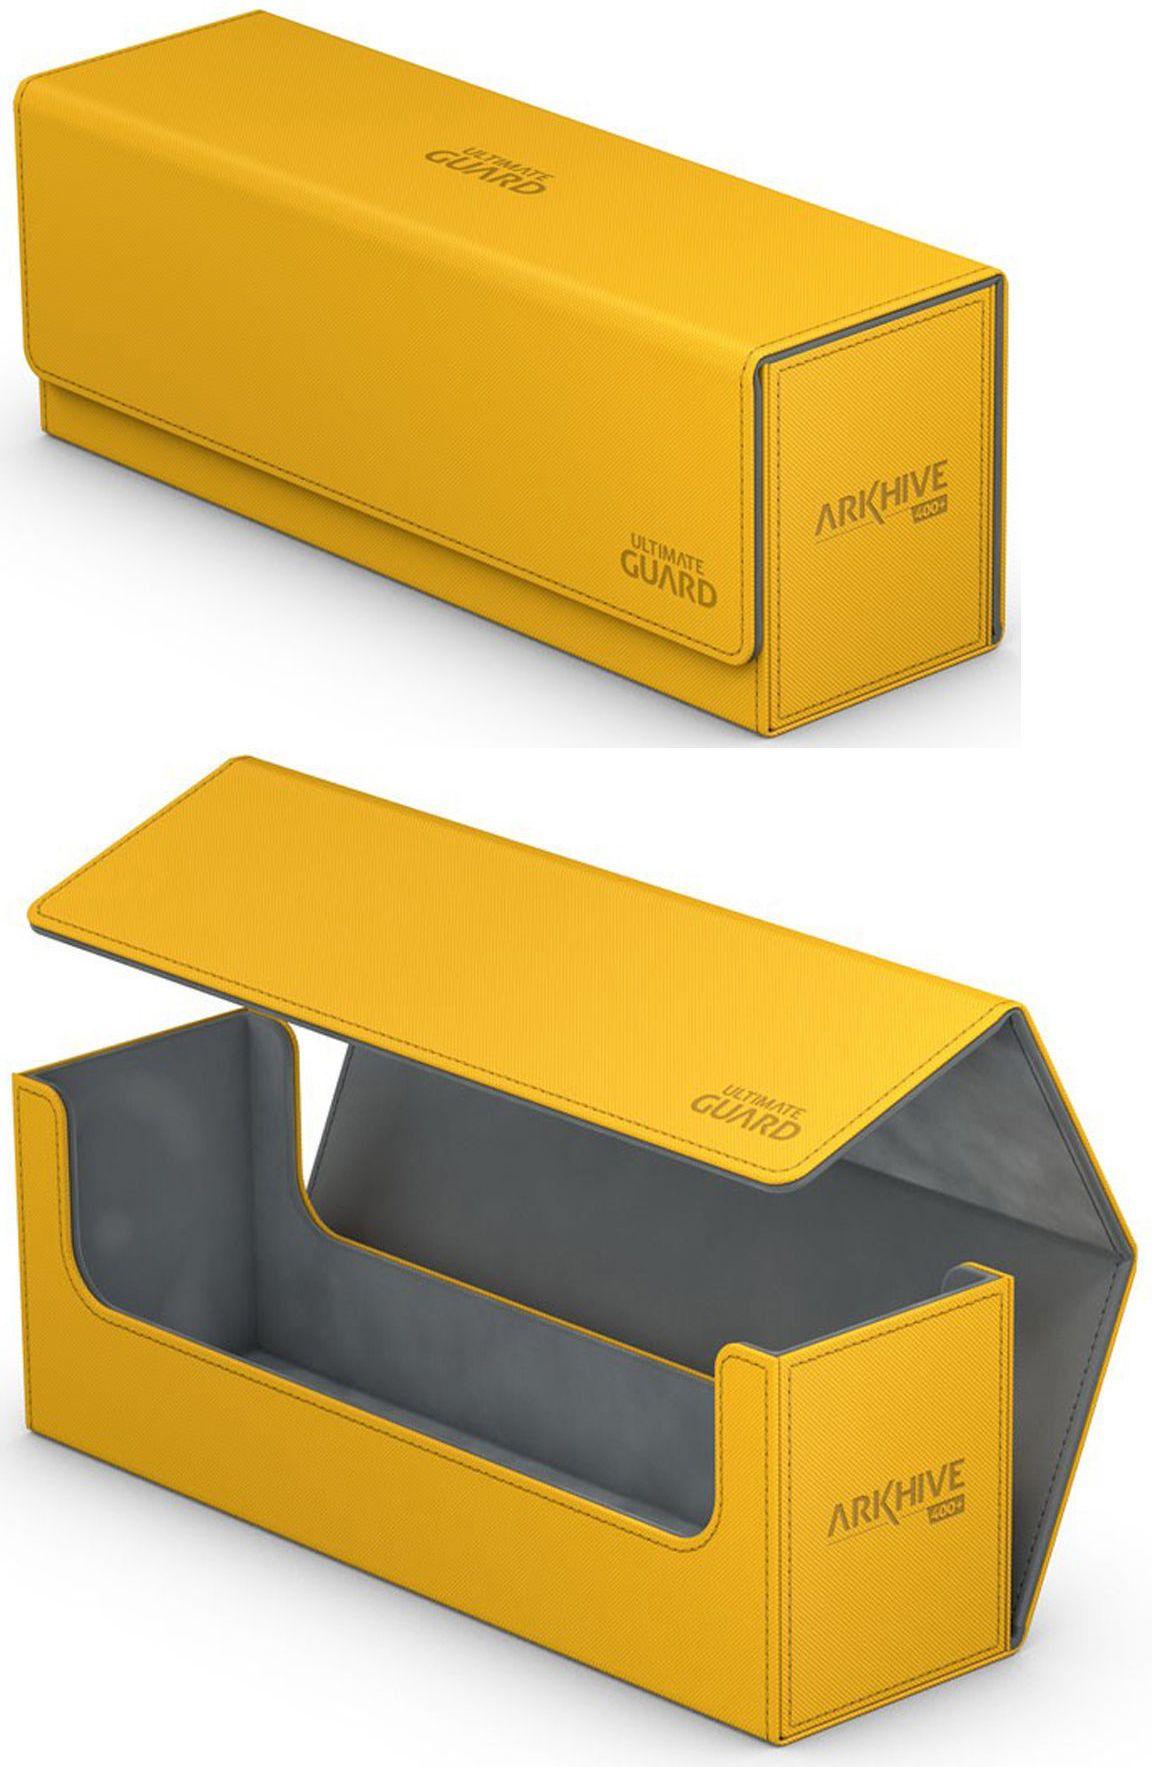 ULTIMATE GUARD ARKHIVE BLACK XENOSKIN FLIP 400 DECK CASE Card Storage Box MTG